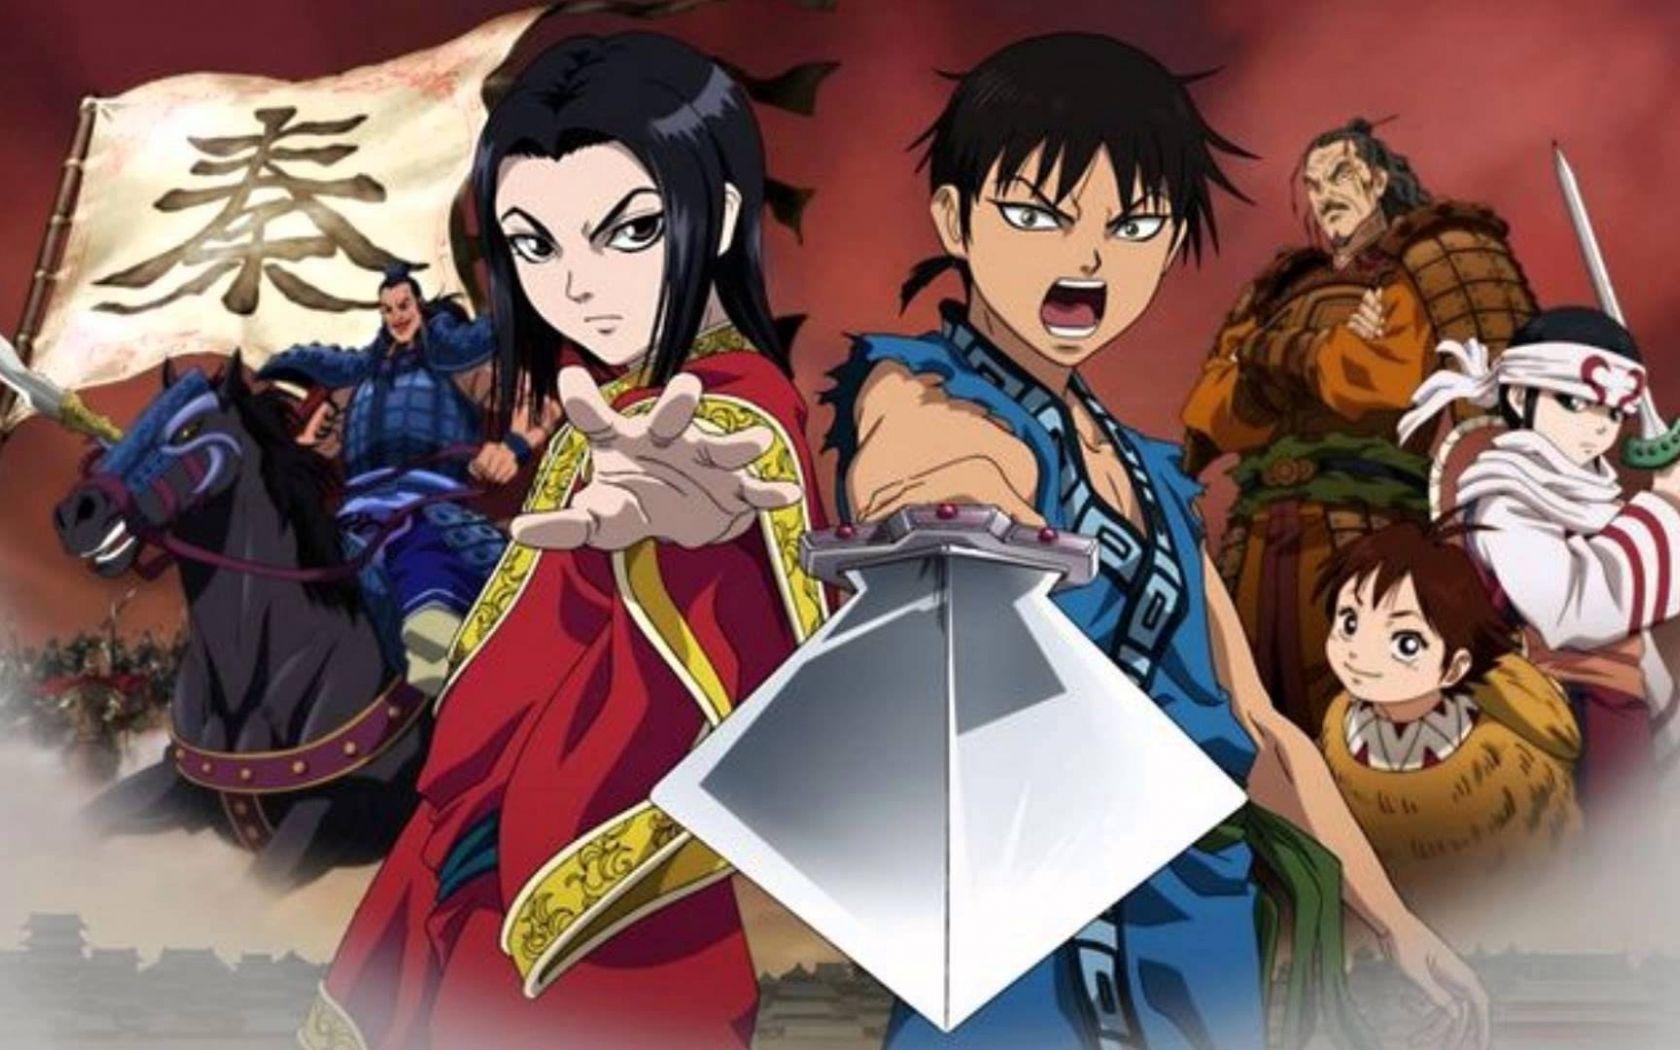 Kingdom 3 Episode 15: Release Date, Spoiler, And Watch Online